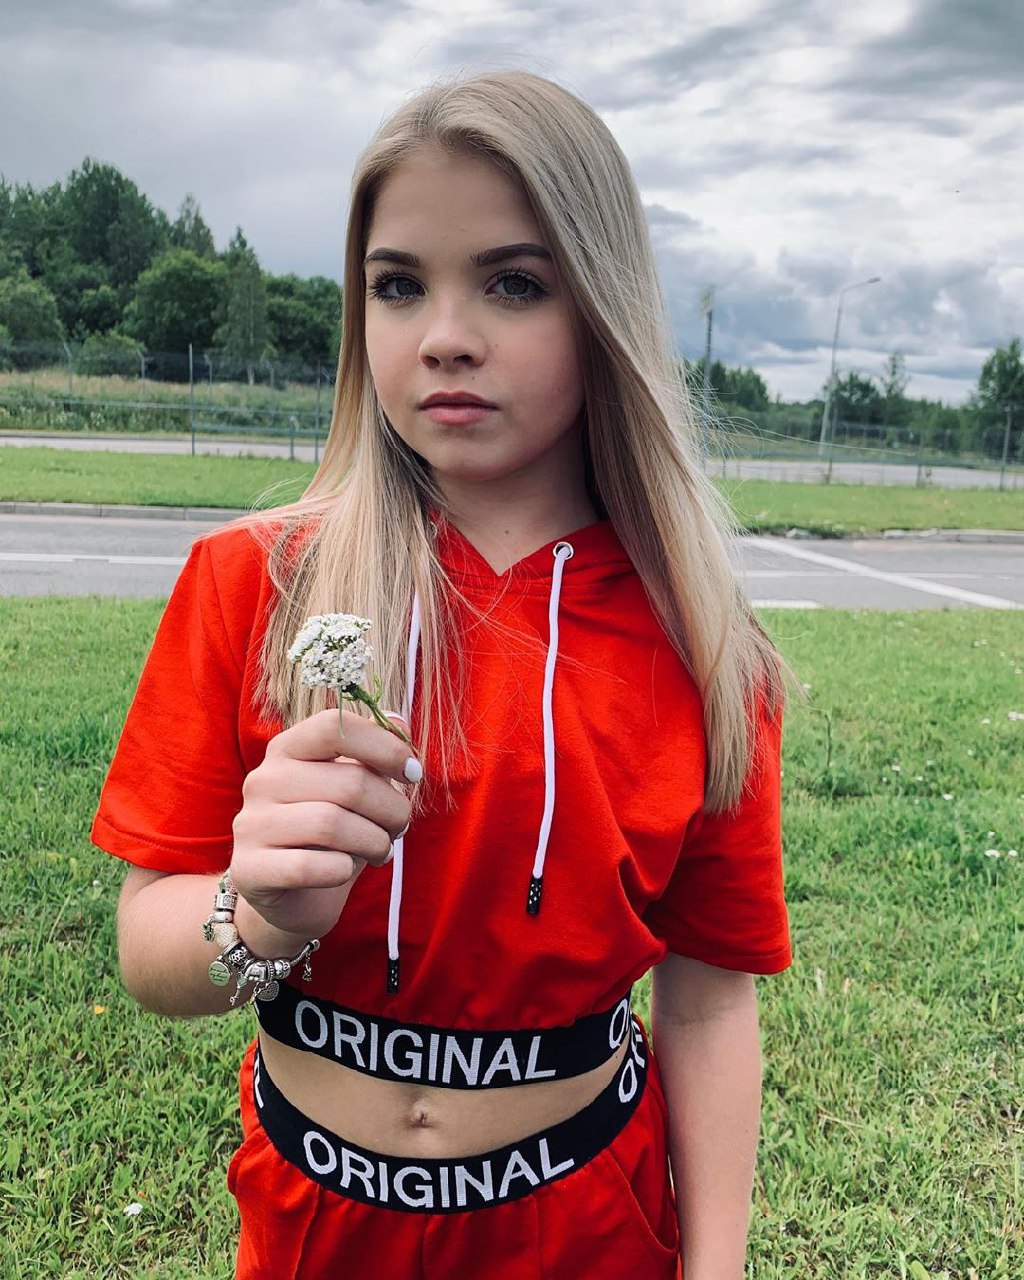 https://i2.imageban.ru/out/2019/07/15/10297a3033ede7b5ccc6be05a9132b31.jpg